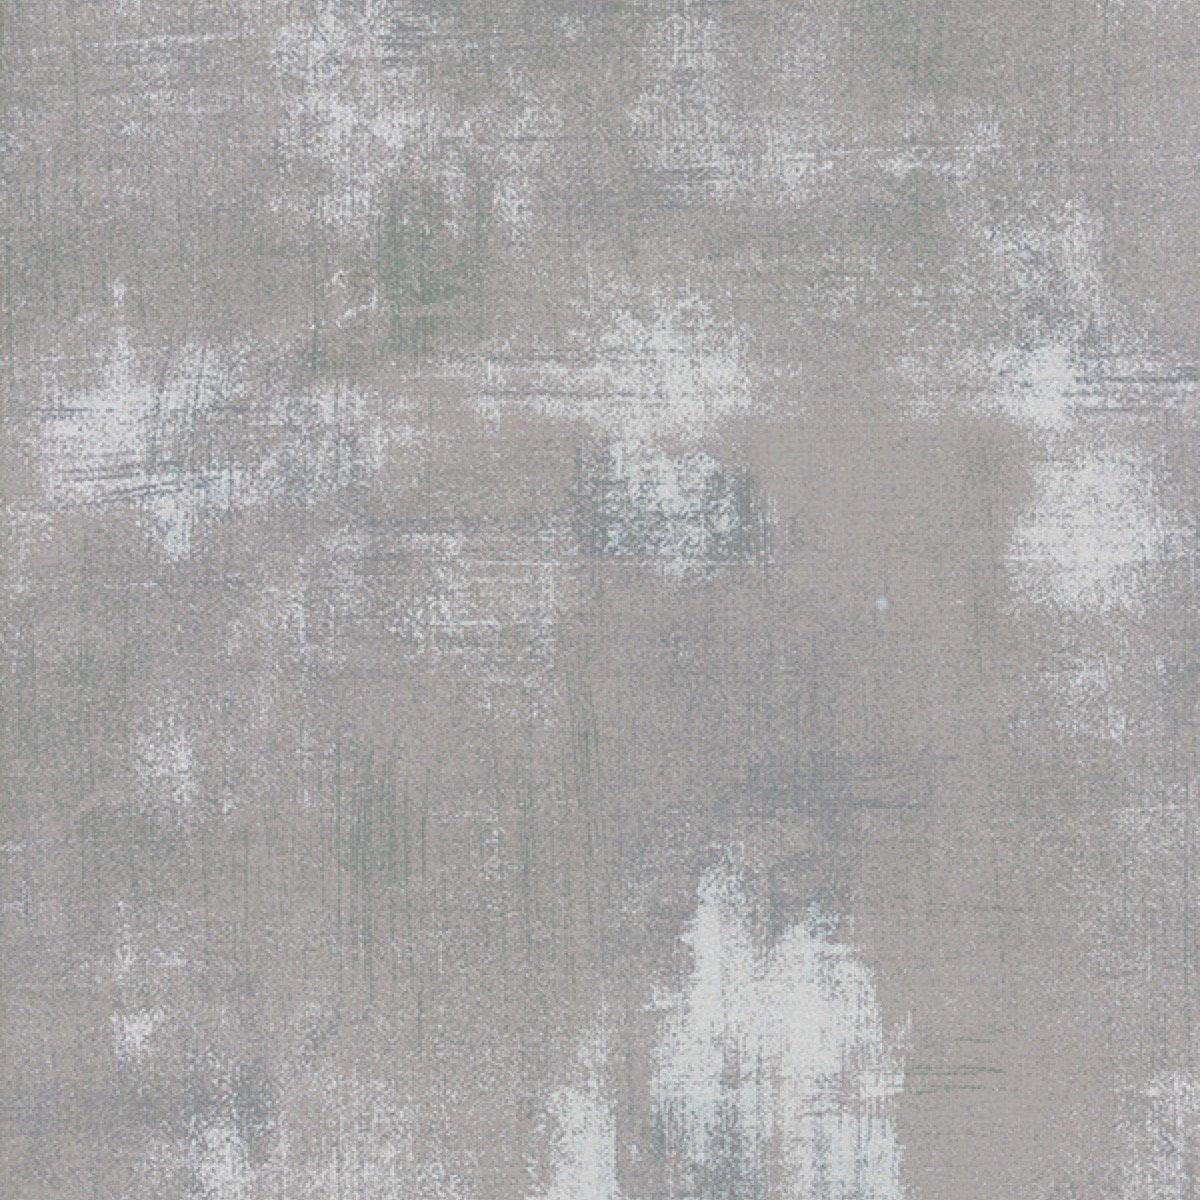 Moda Fabrics Grunge Texture New Colors 2017~ Silver  Cotton Fabric